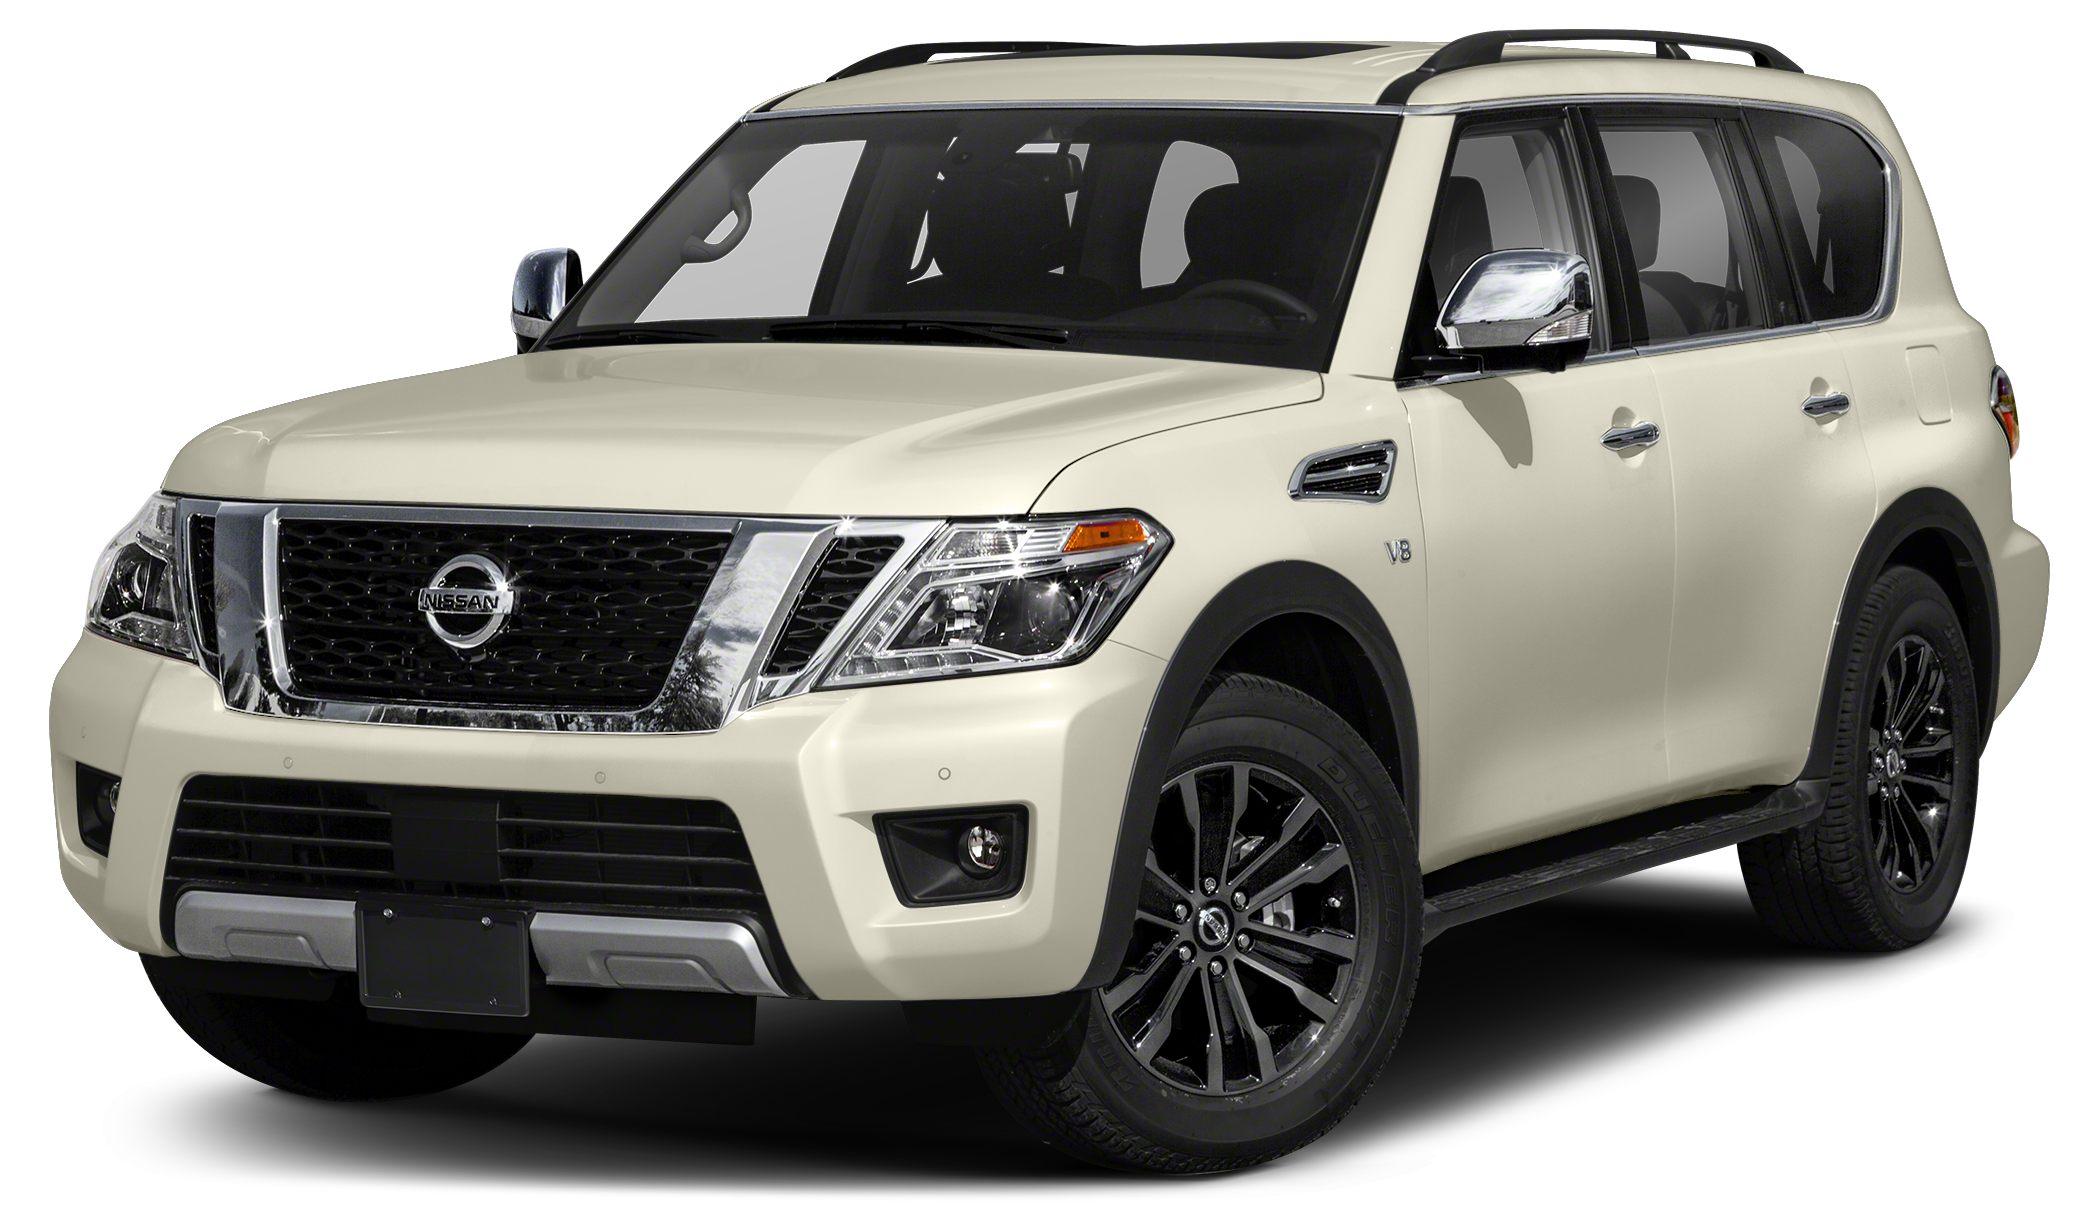 2017 Nissan Armada Platinum This 2017 Nissan ARMADA Platinum will sell fast Navigation Blueto